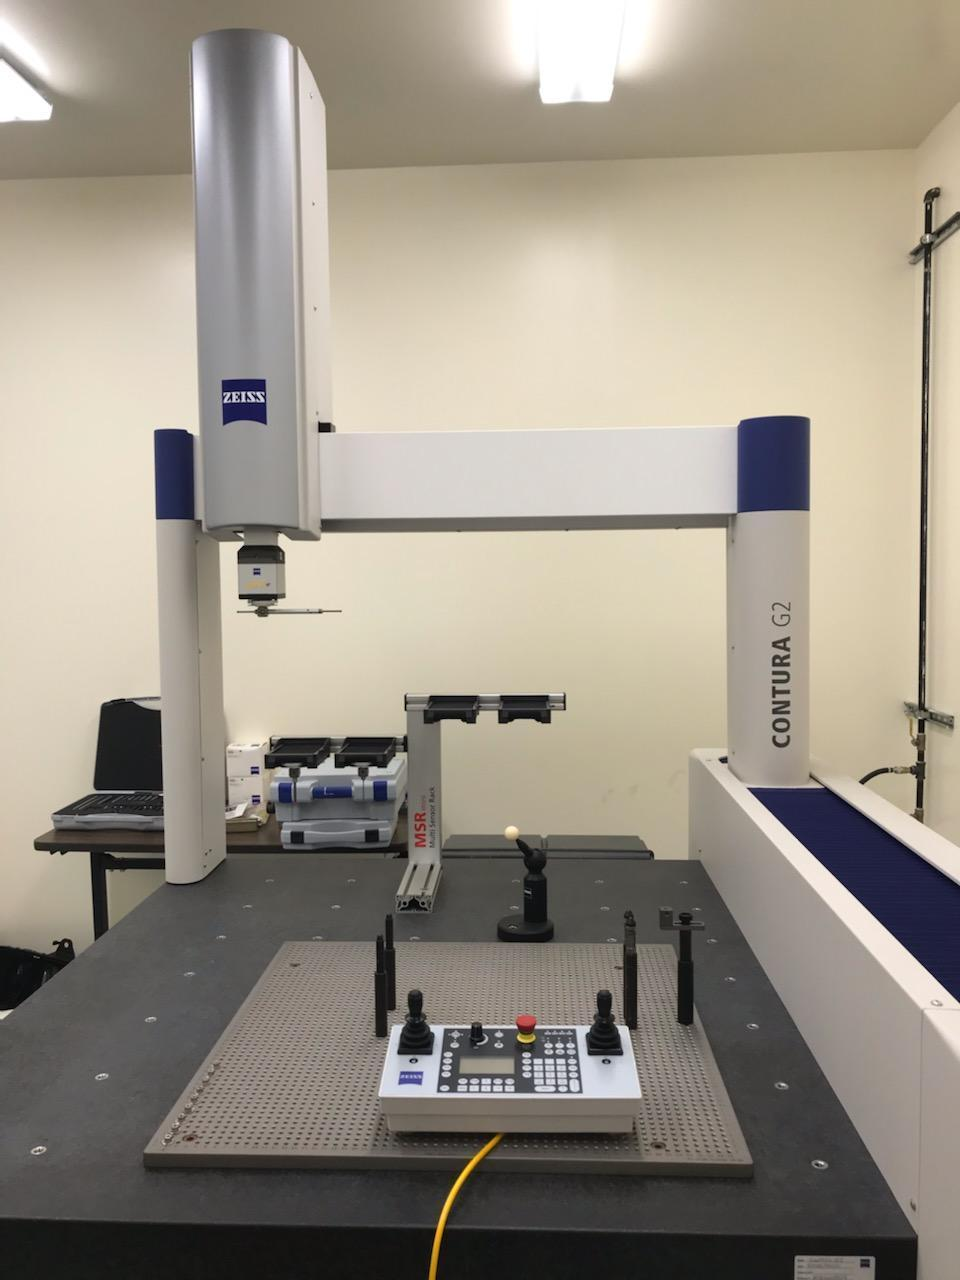 ZEISSZeiss Contura G2 Activ 10/12/6 Coordinate Measuring Machine (CMM)